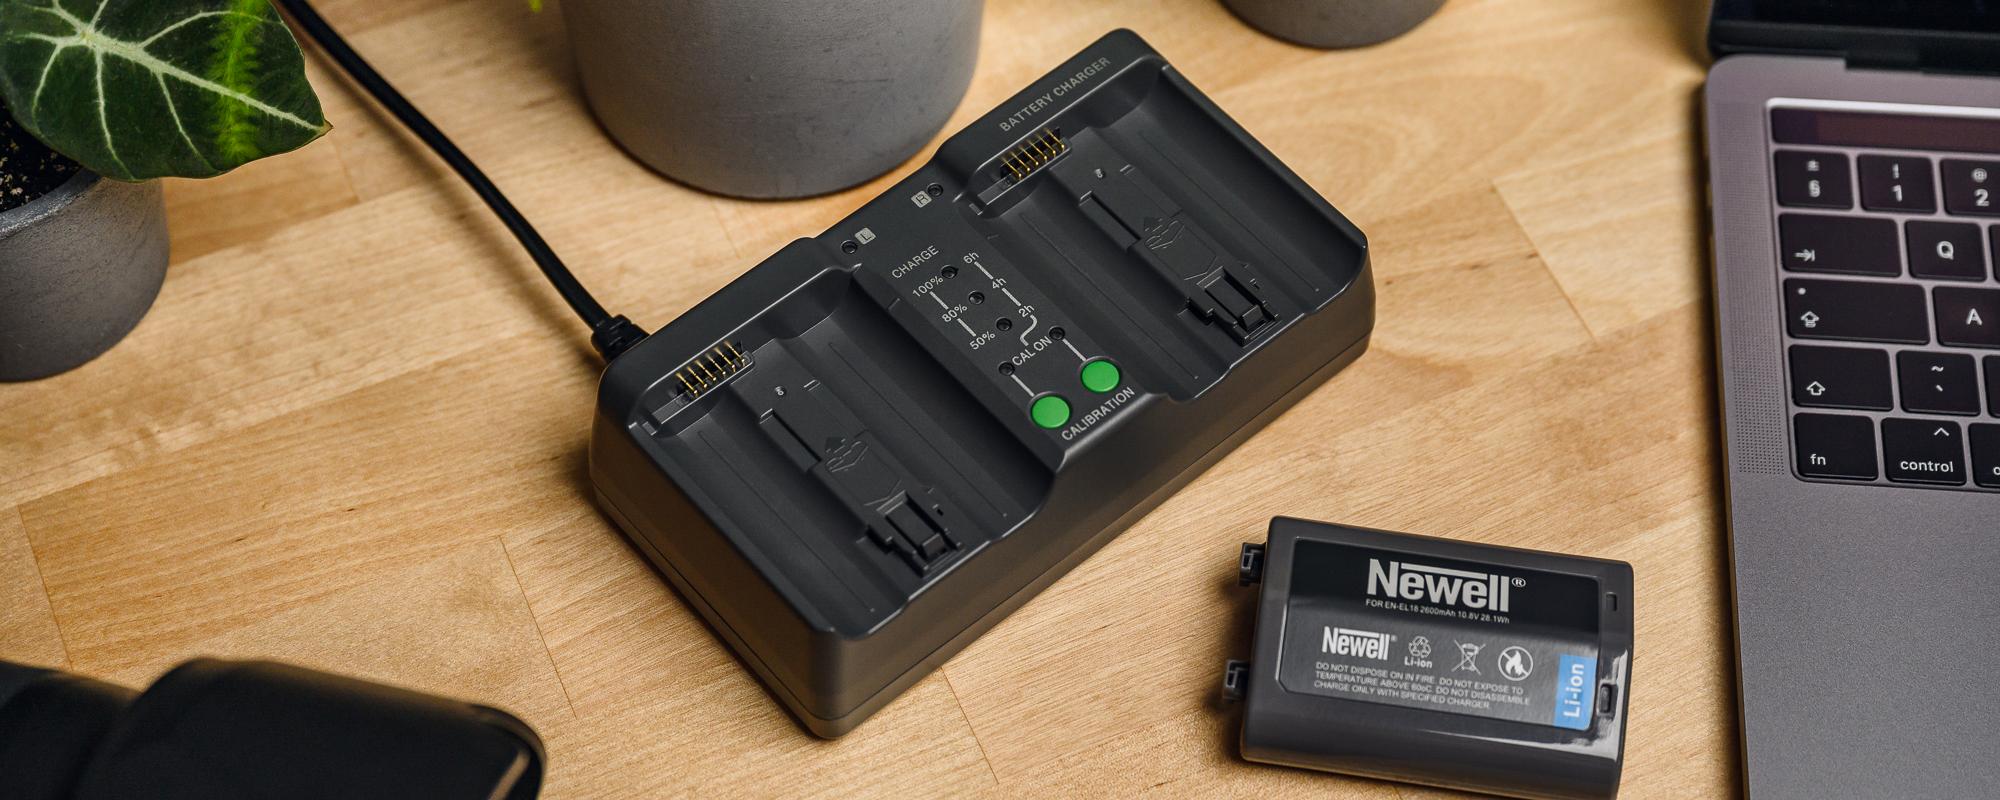 Ładowarka dwukanałowa Newell BC-18B do akumulatorów EN-EL18